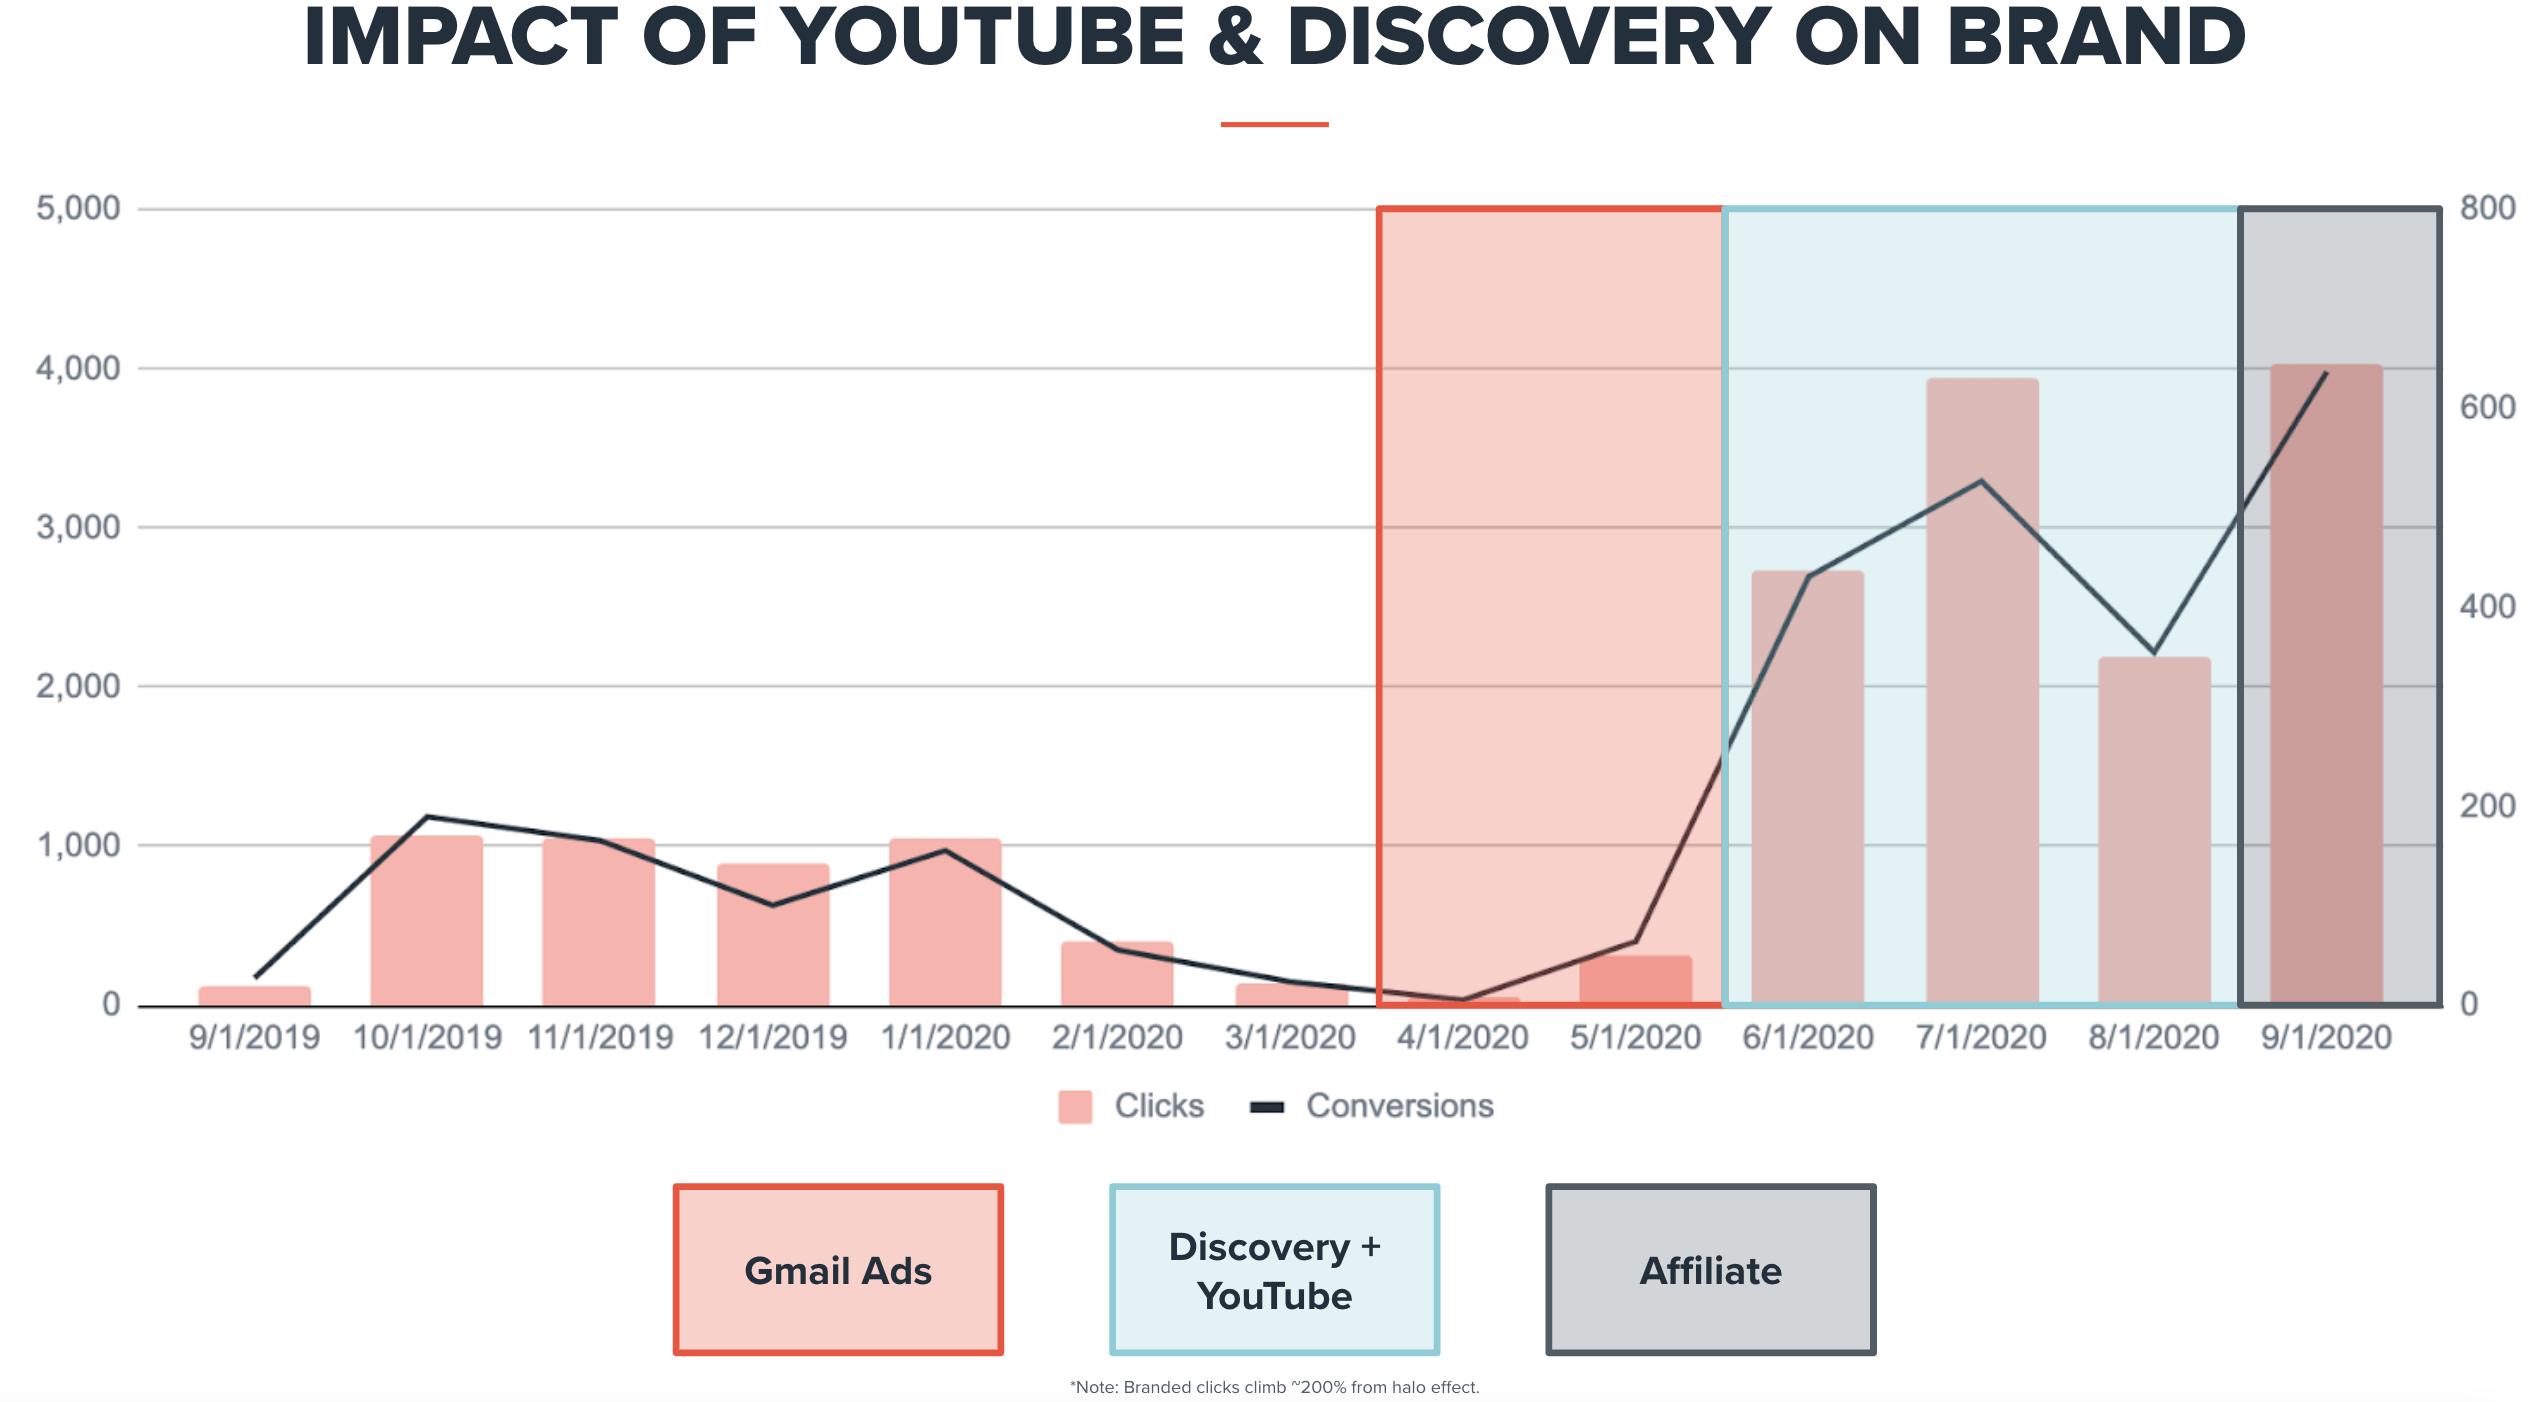 impact-of-youtube-marketing-brand-performance